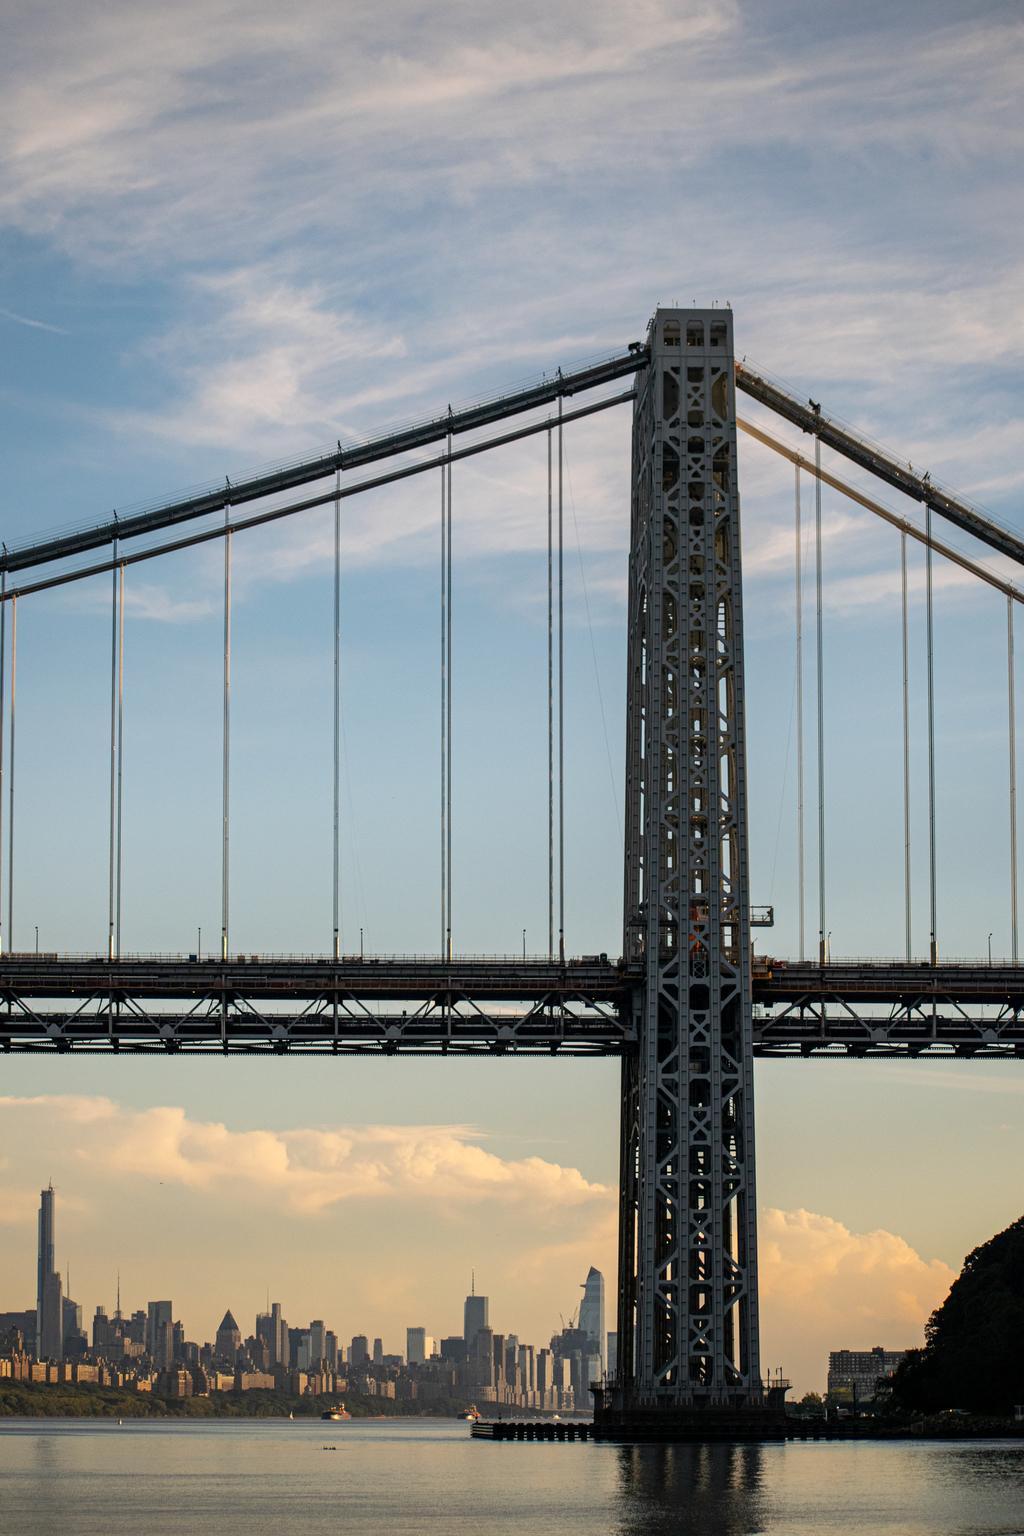 George Washington Bridge via Steven Hughes